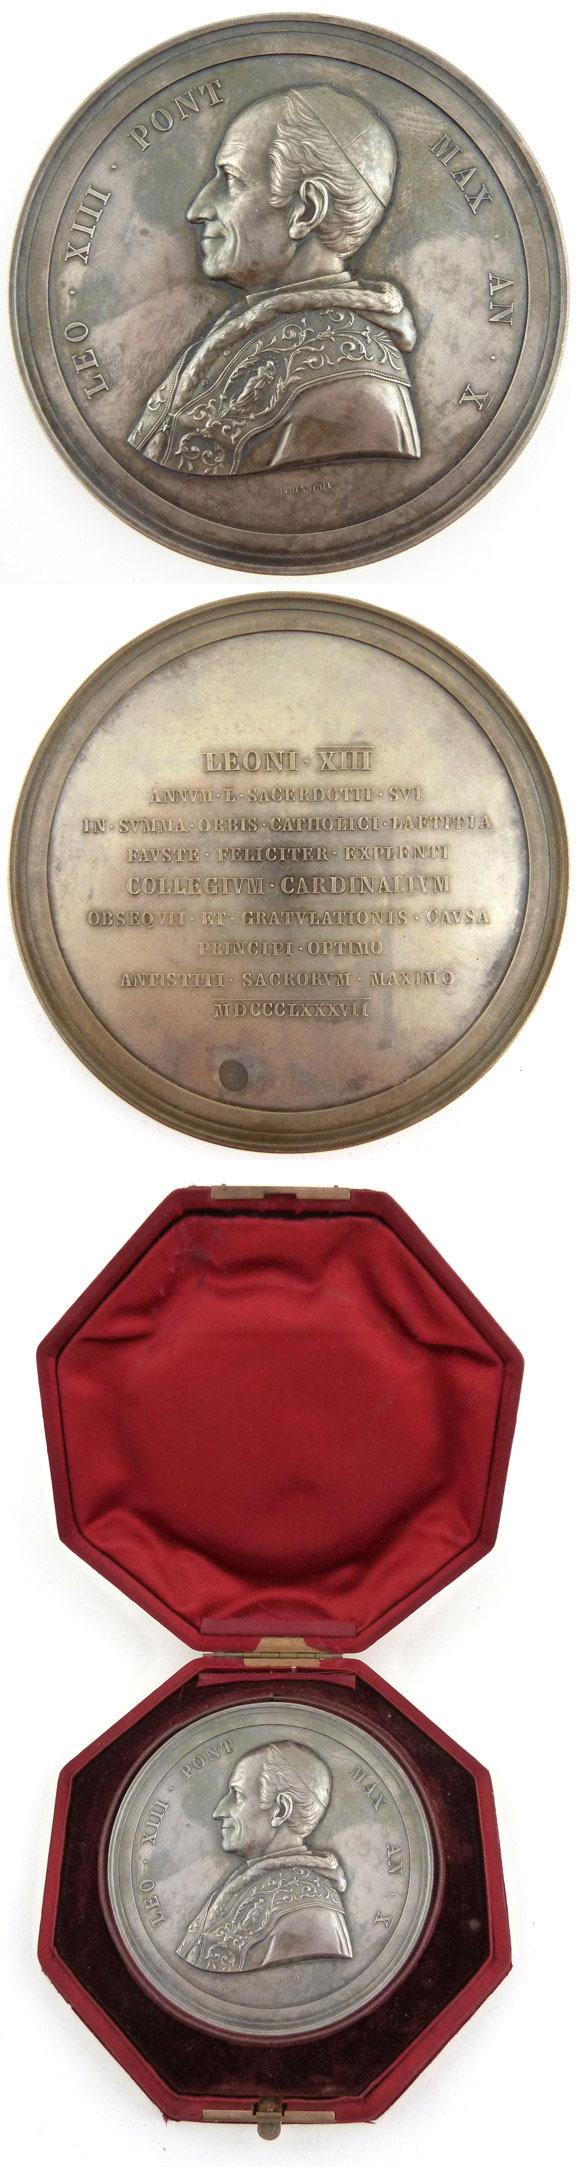 Leo XIII 1887 Golden Jubilee of Ordination 82mm Photo